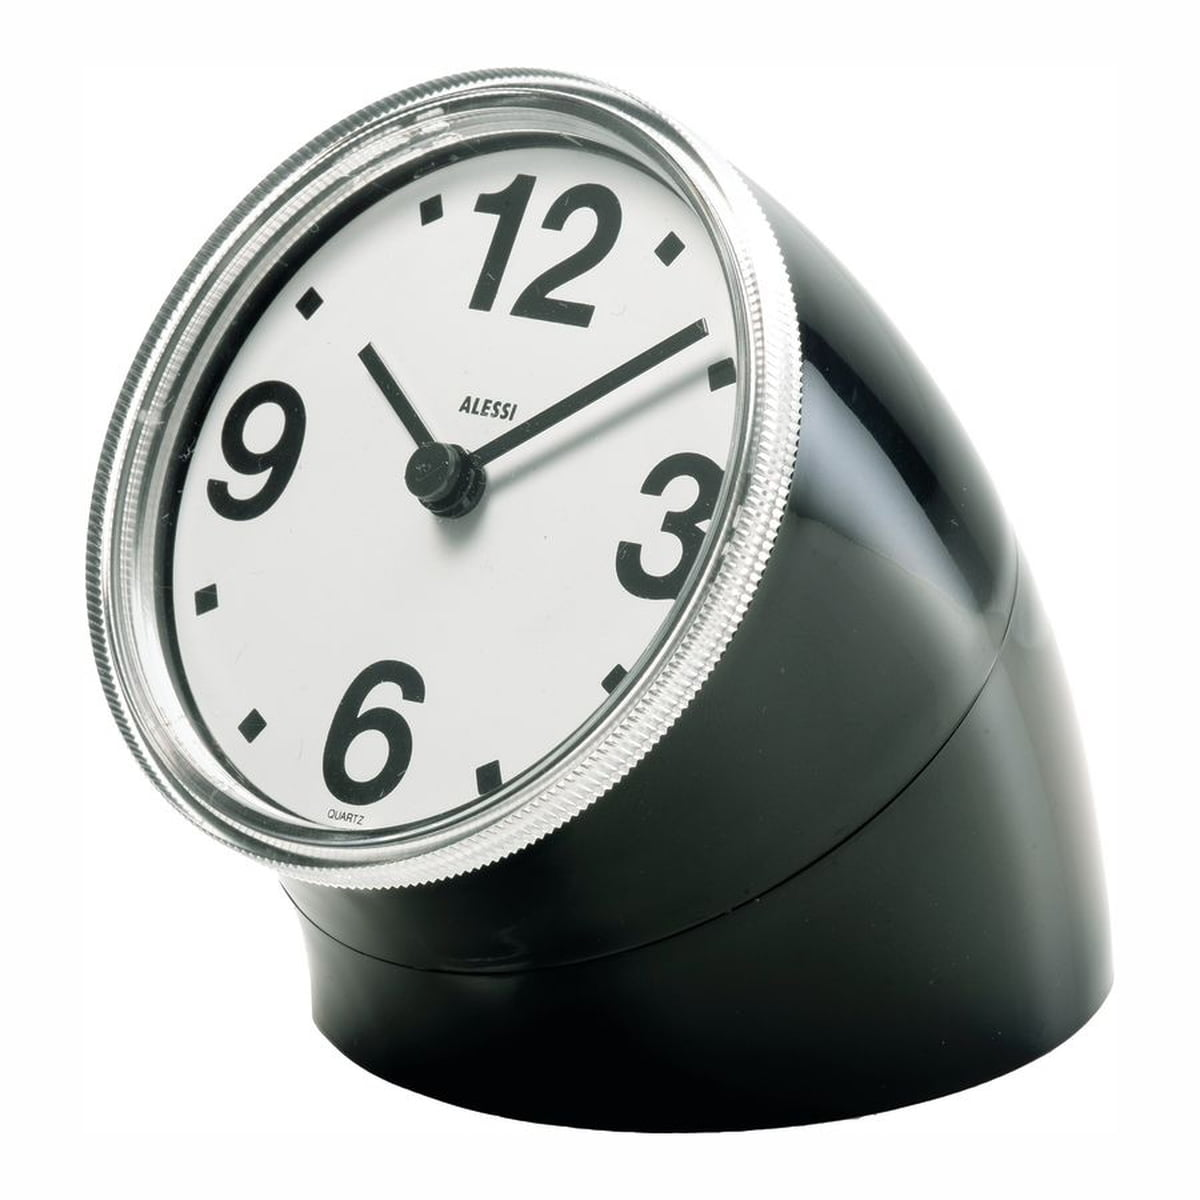 Horloge De Bureau Originale alessi - horloge de table cronotime, noir